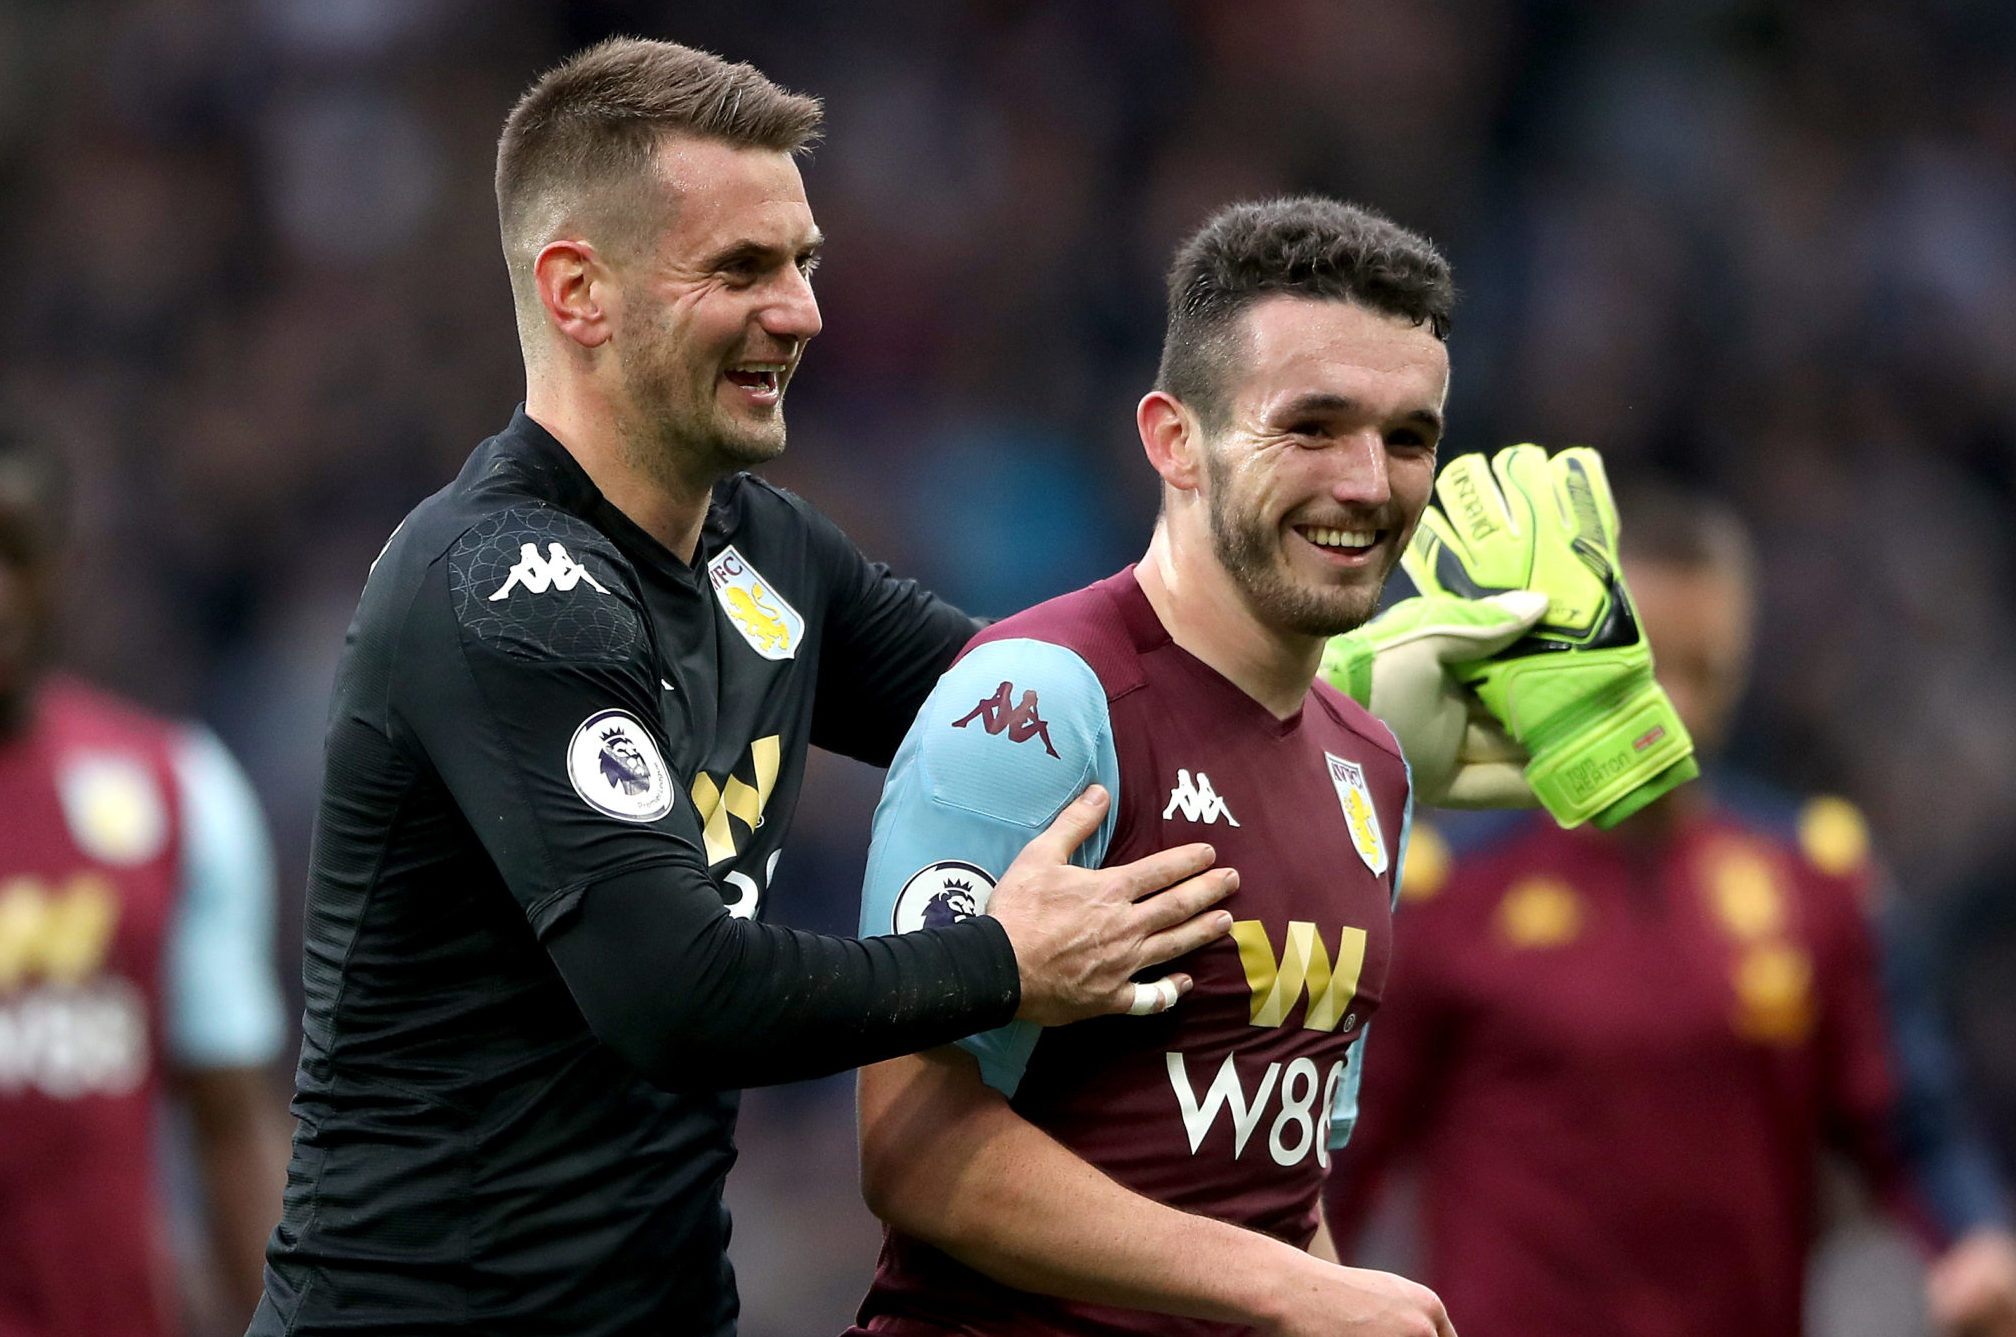 Aston Villa's goalkeeper Tom Heaton (left) and John McGinn during the Premier League match at Villa Park, Birmingham